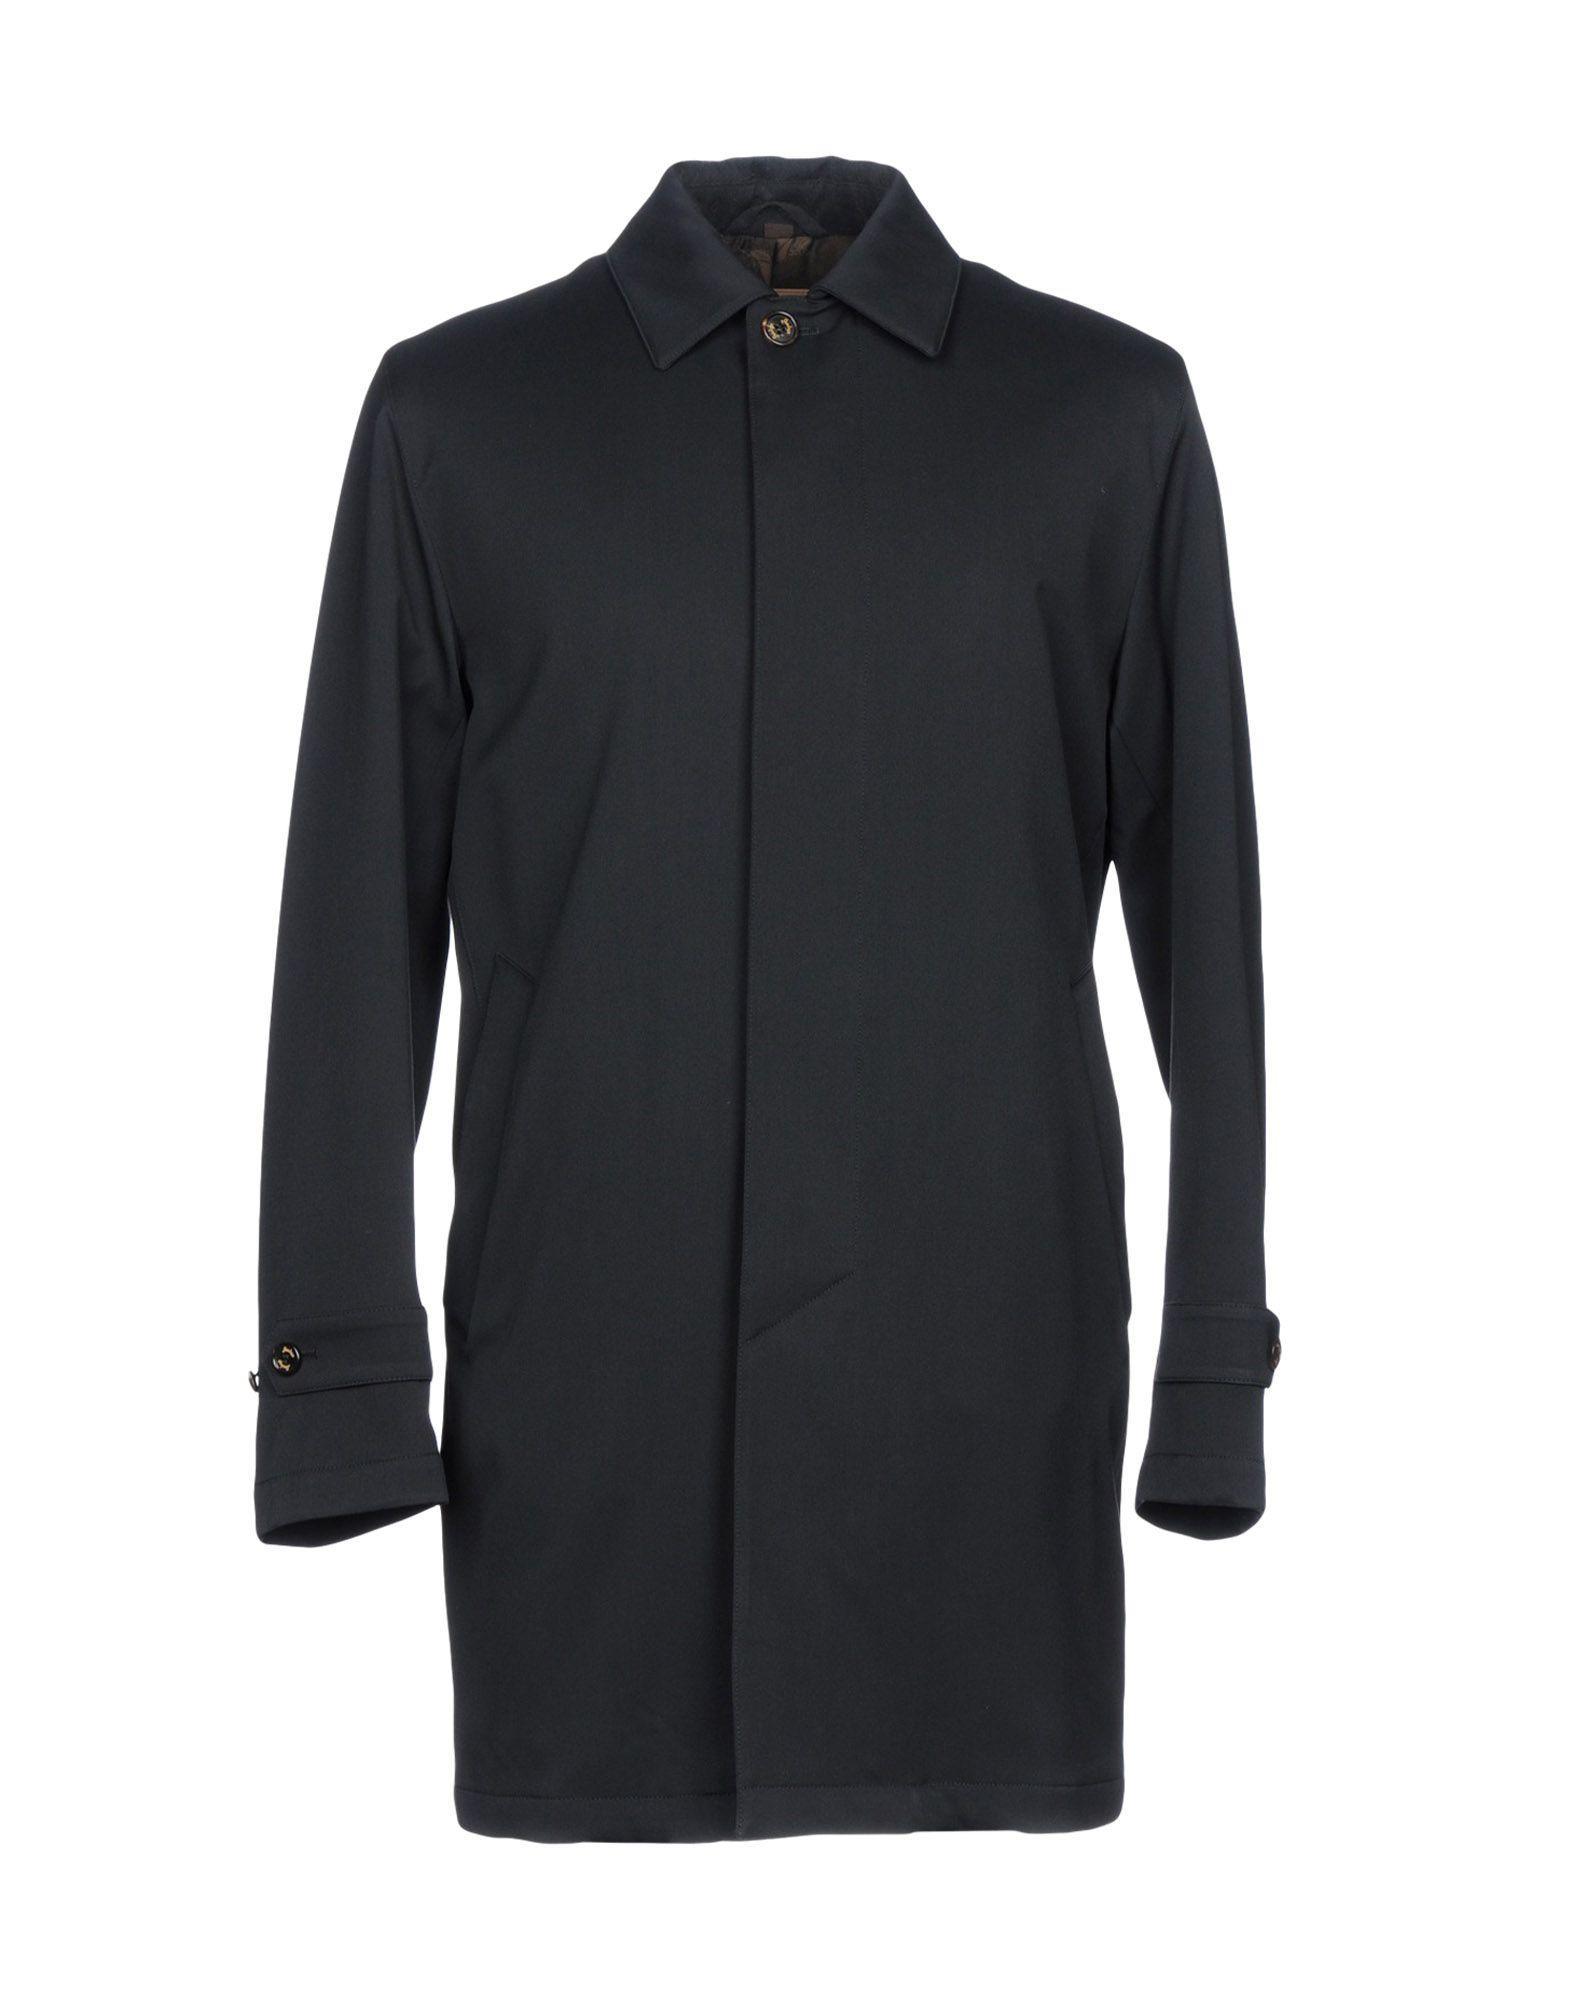 Sealup Full-length Jacket In Dark Green